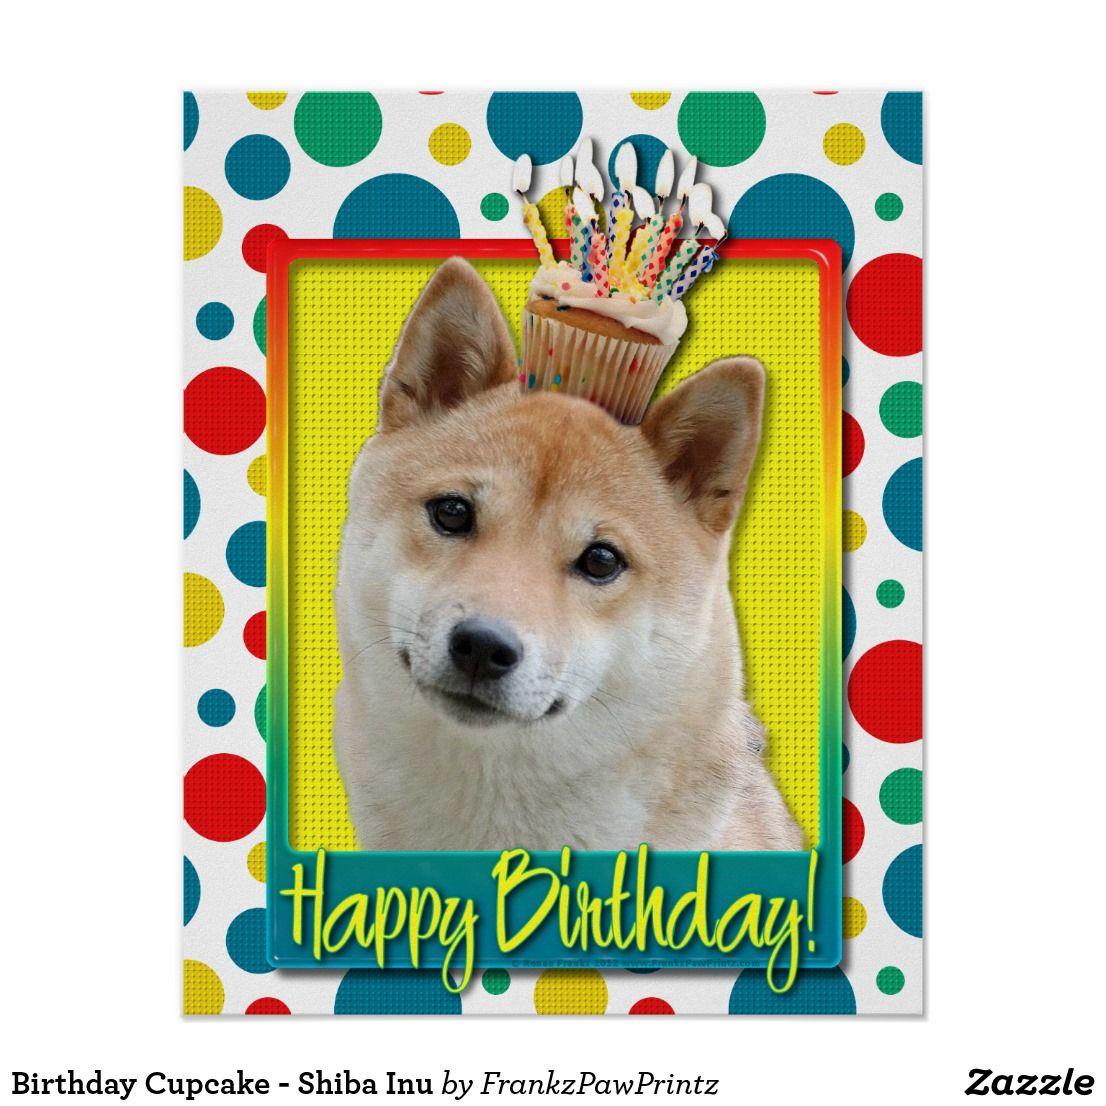 Birthday Cupcake Shiba Inu Poster Zazzle Com Shiba Inu Dog Greeting Cards Shiba